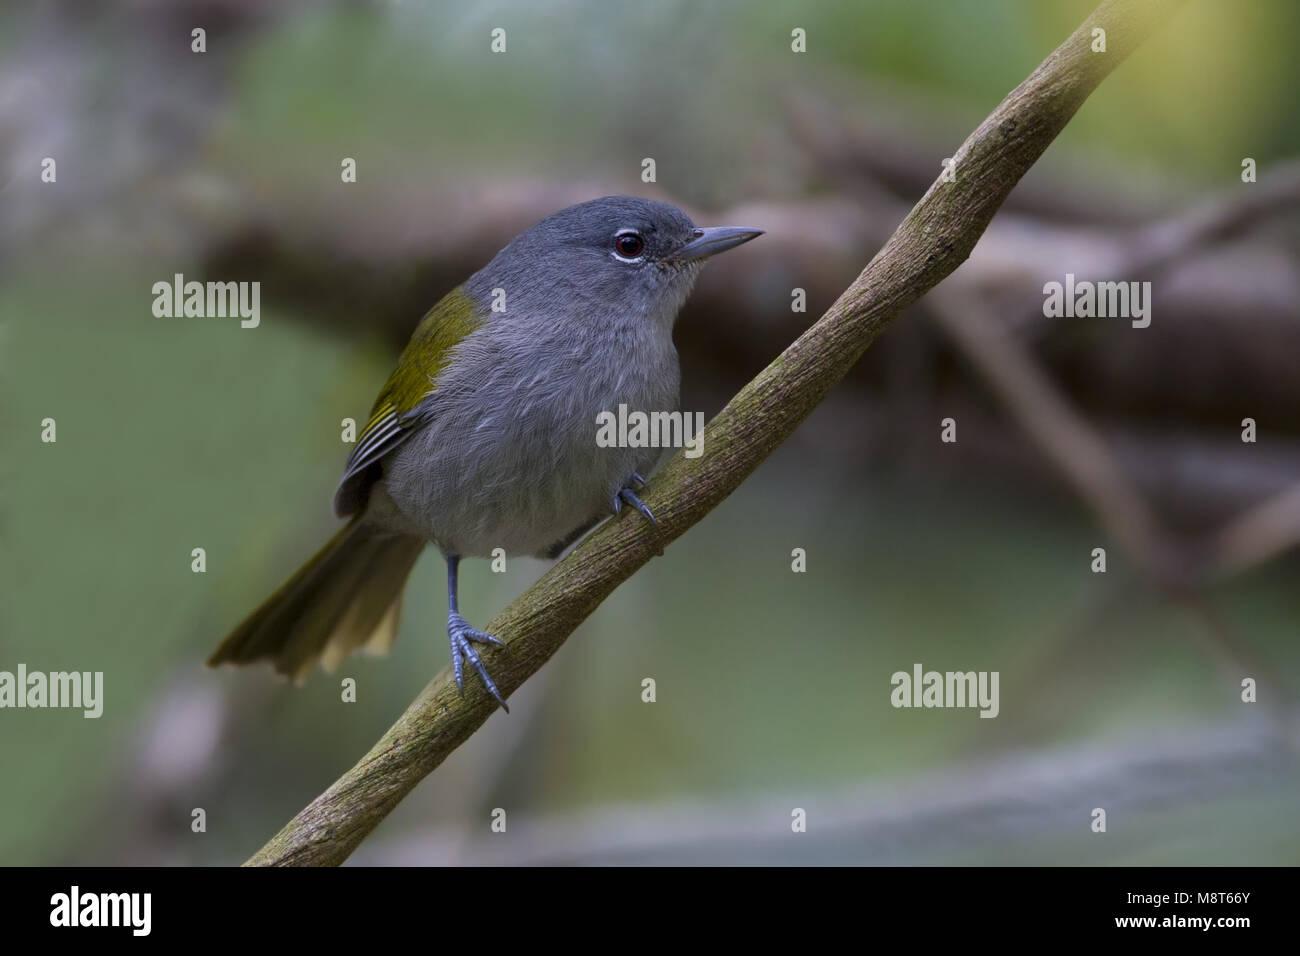 Haïtizanger, Green-tailed Warbler - Stock Image